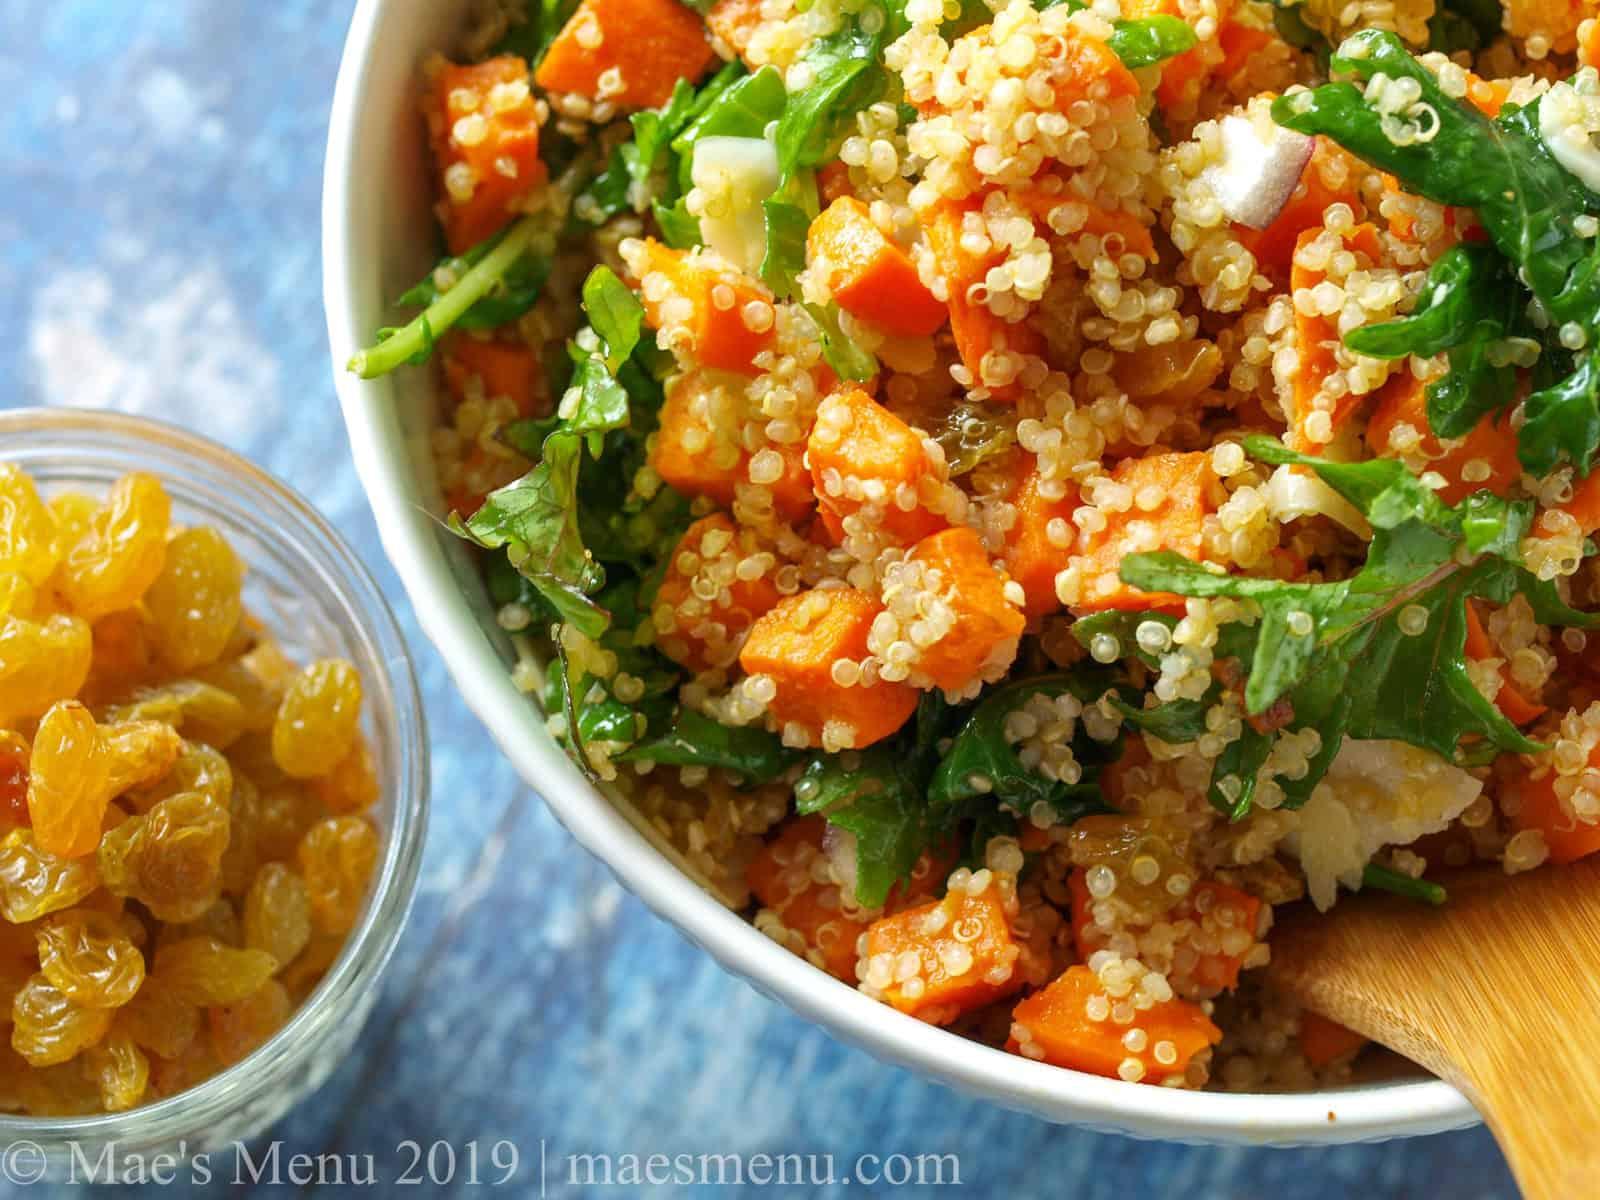 A large bowl of sweet potato & quinoa salad.